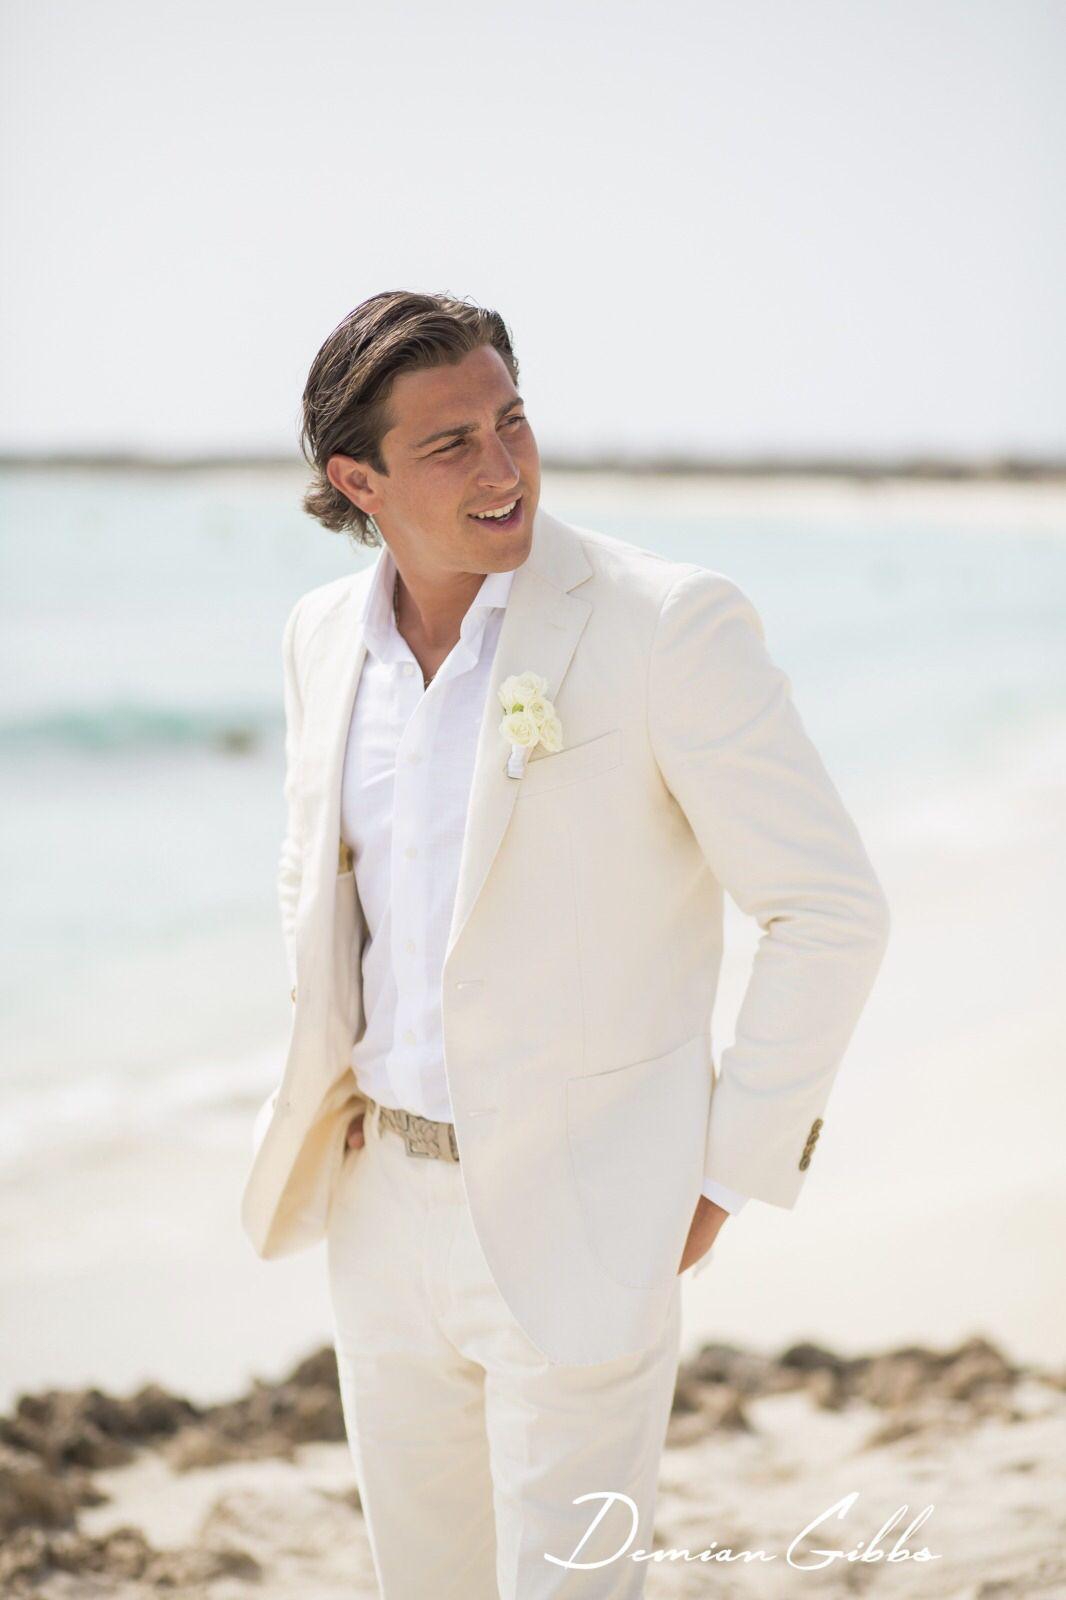 Beach wedding groom attire SuitSupply NYC Wedding Location